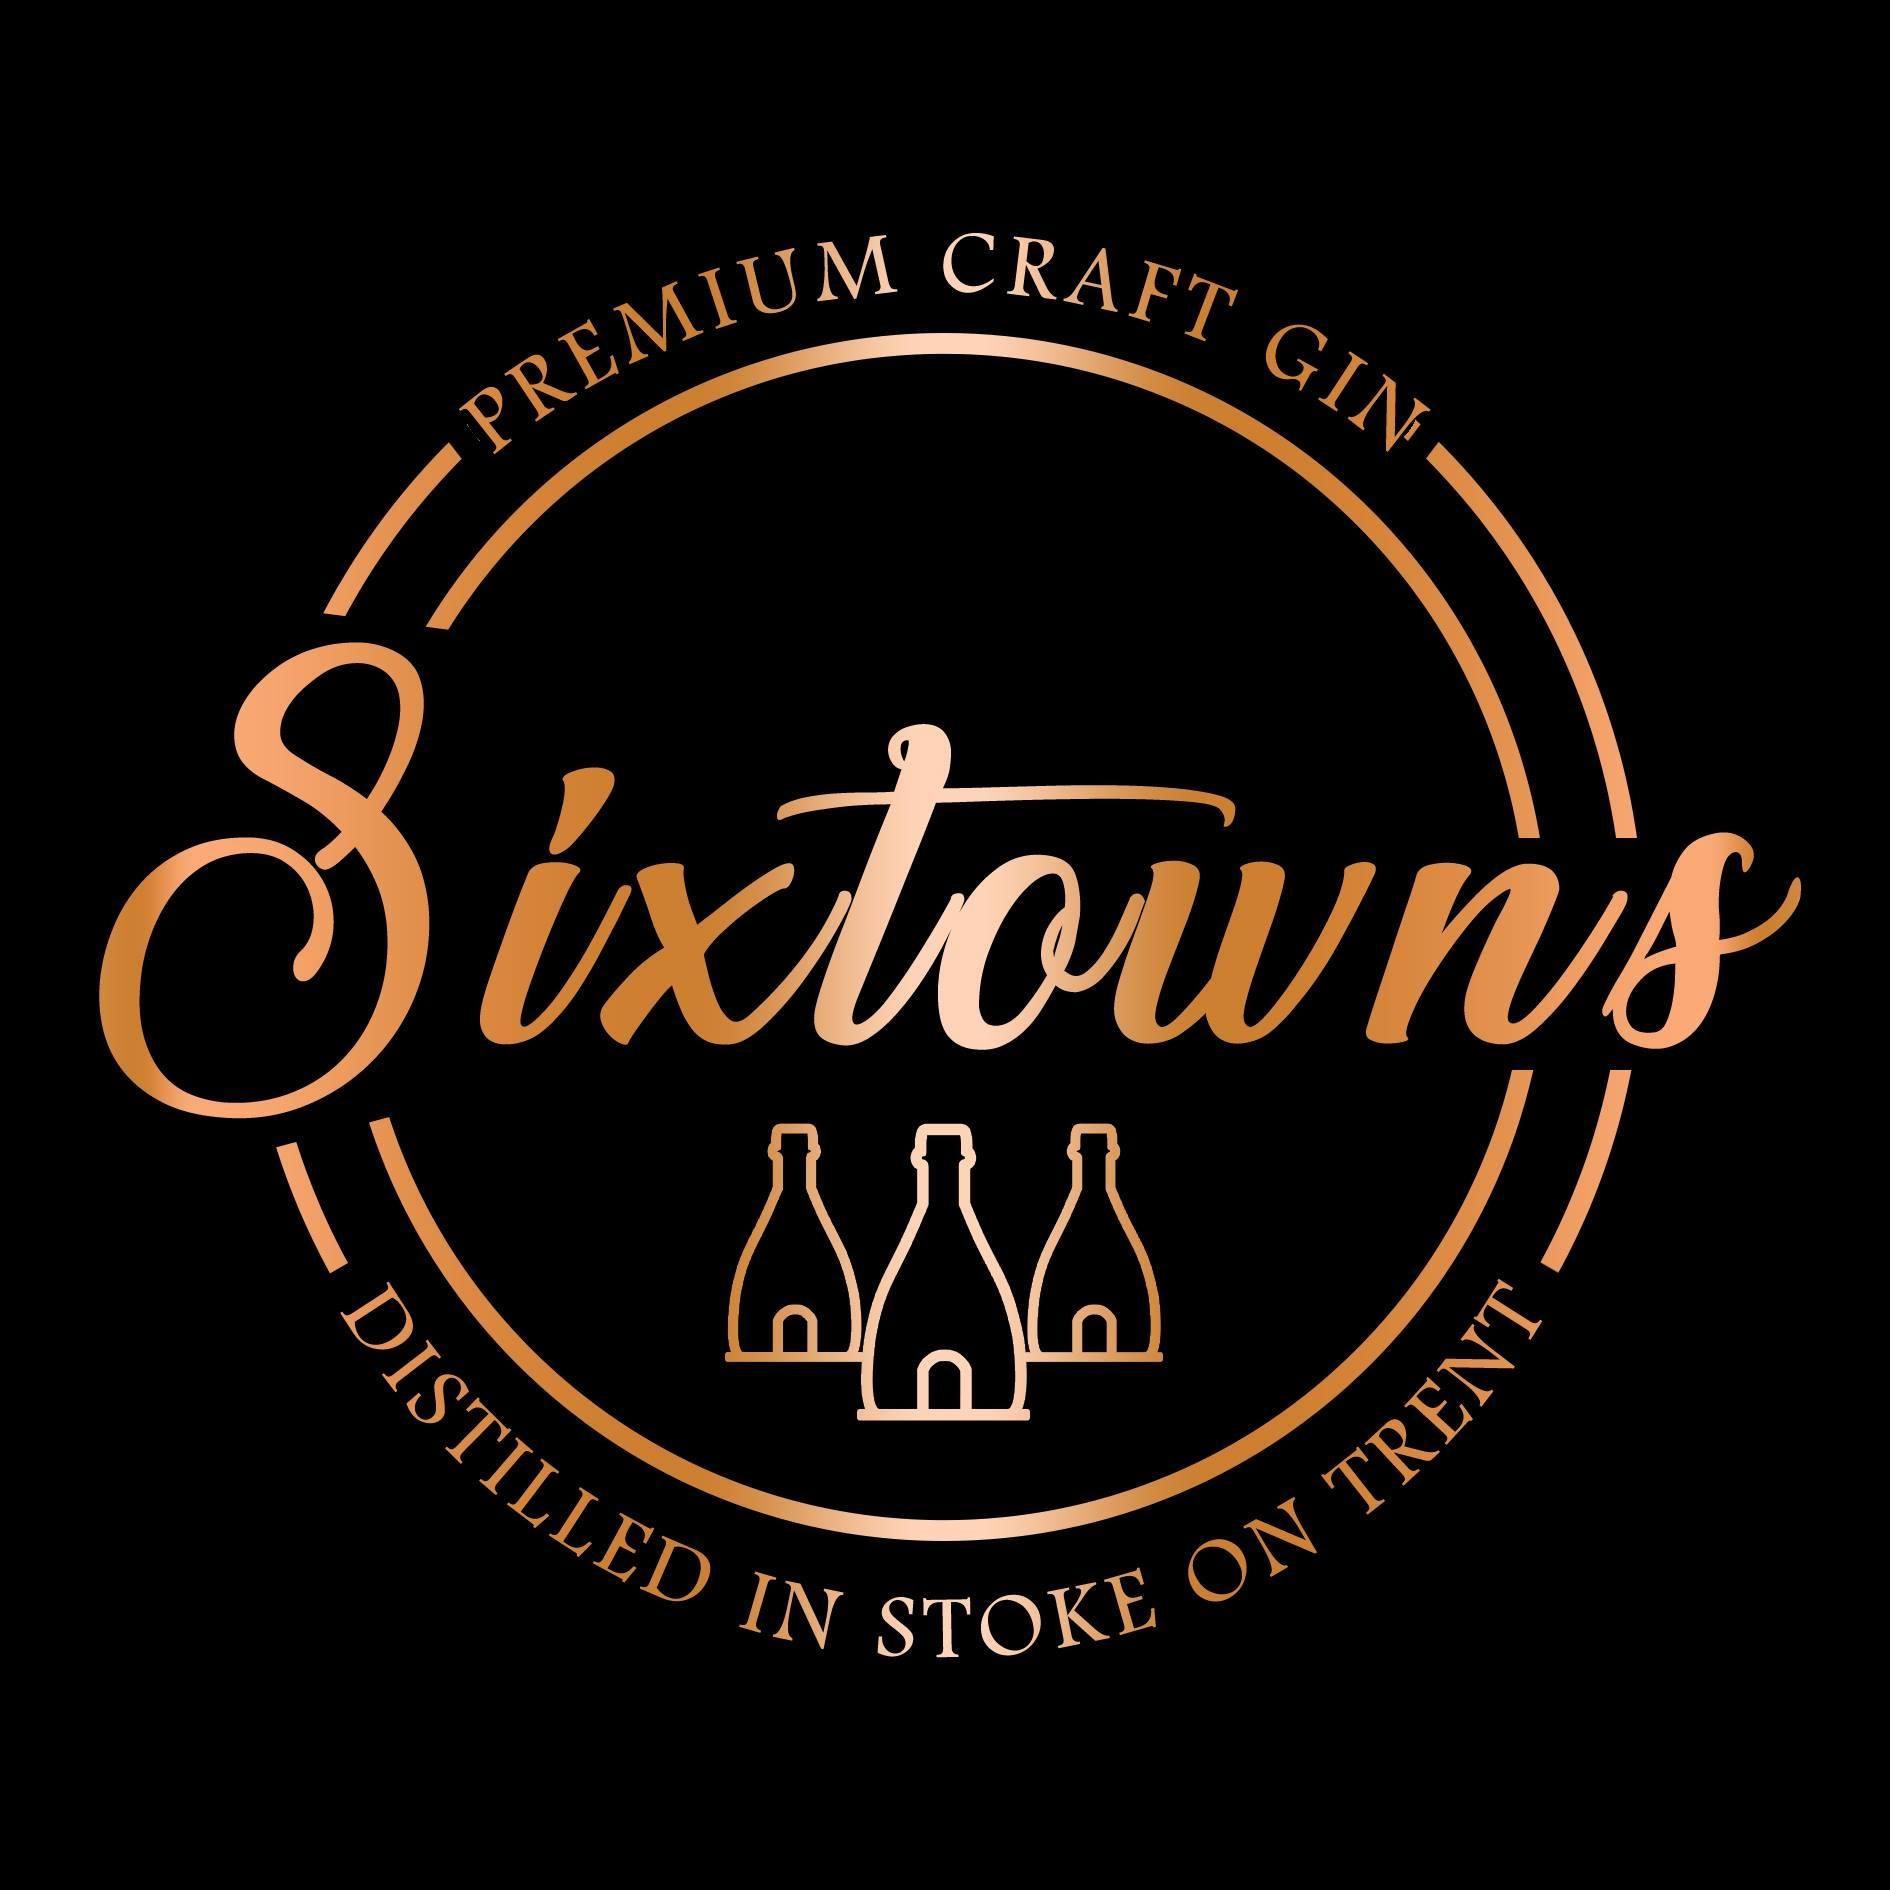 Sixtowns Gin